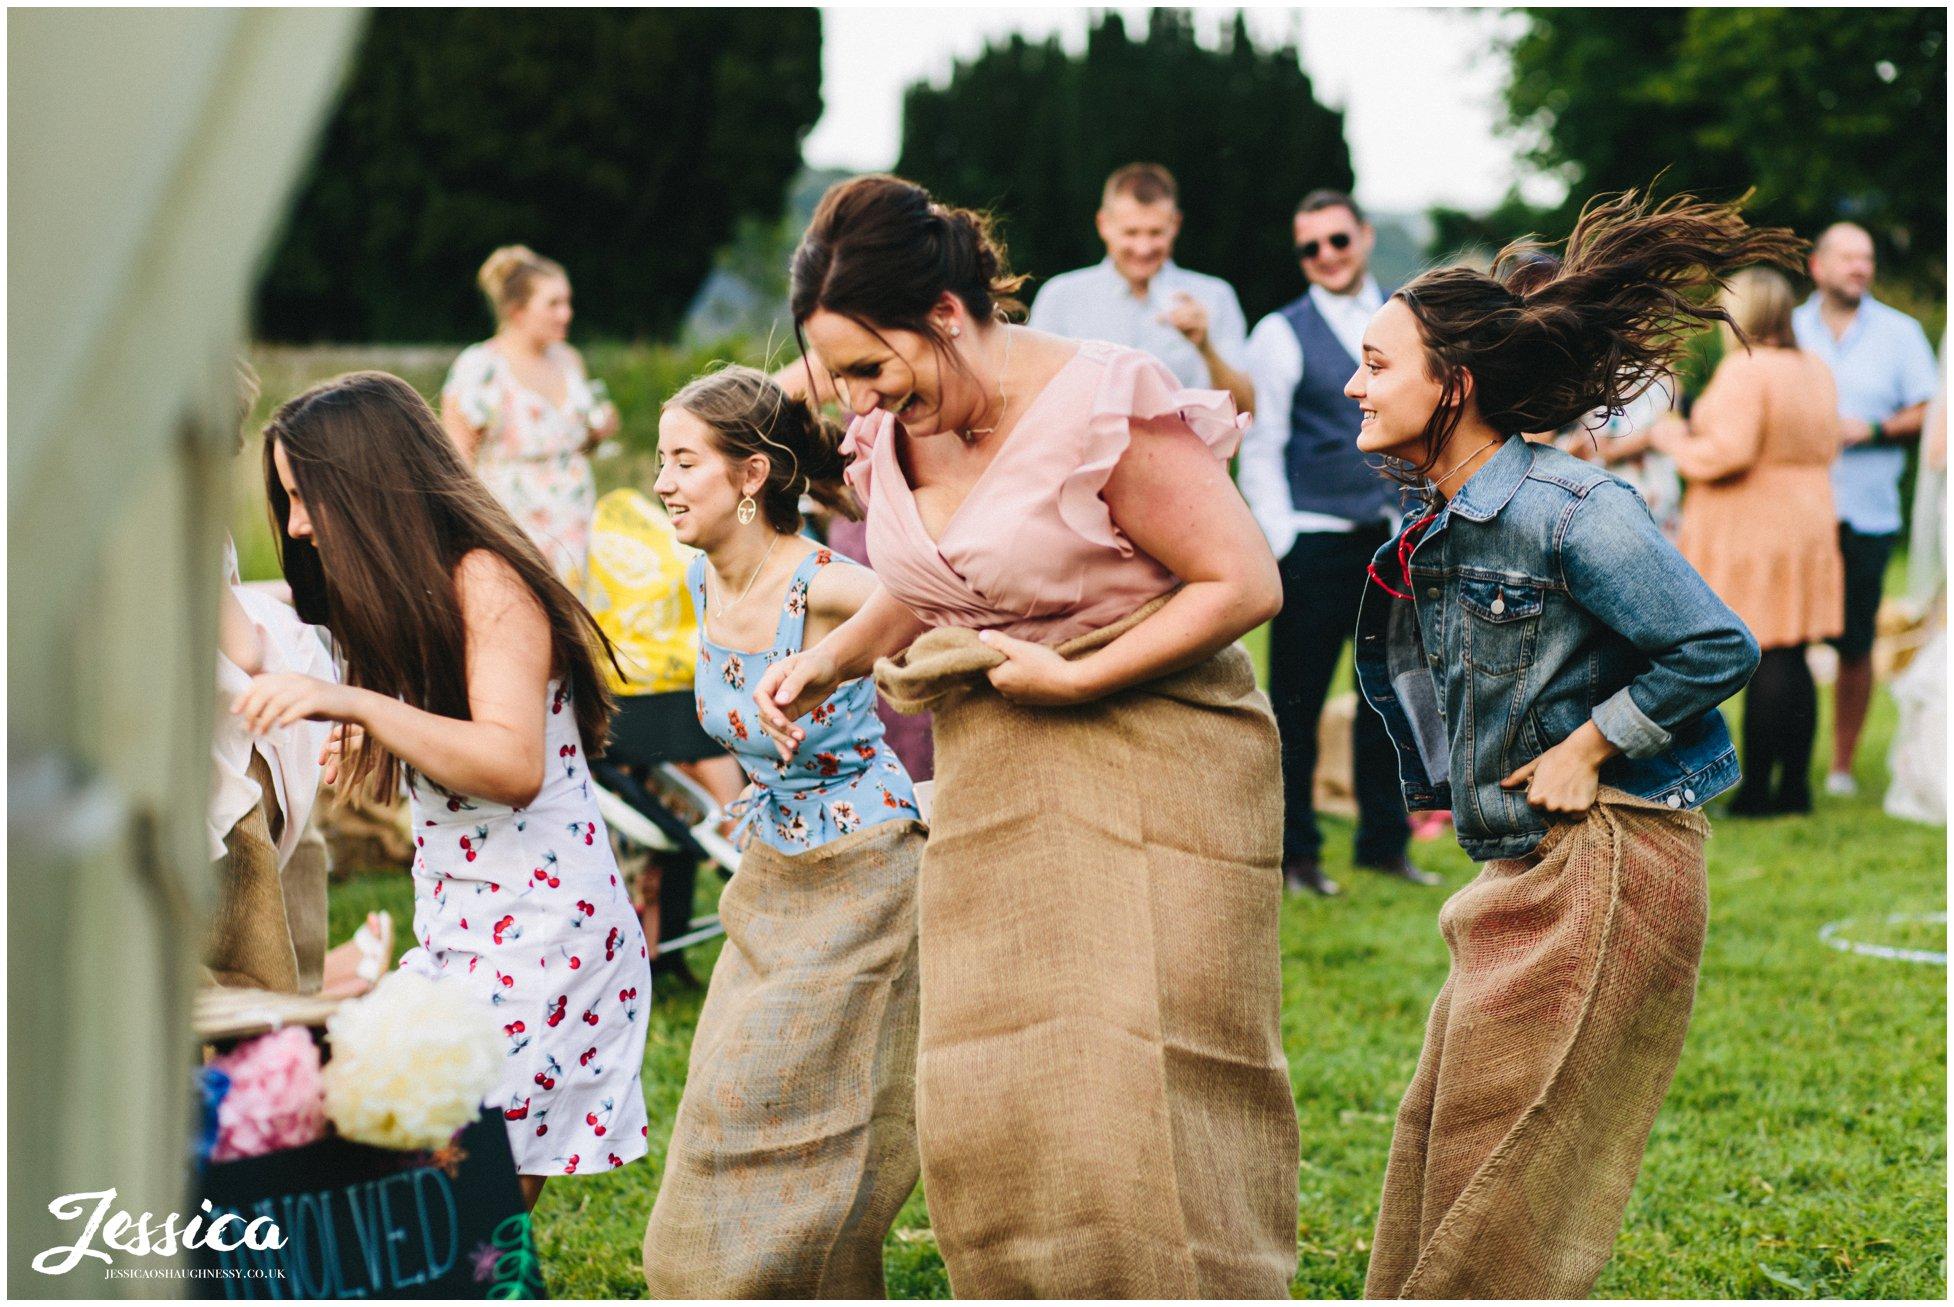 wedding guests enjoy a sack race in eyam hall gardens